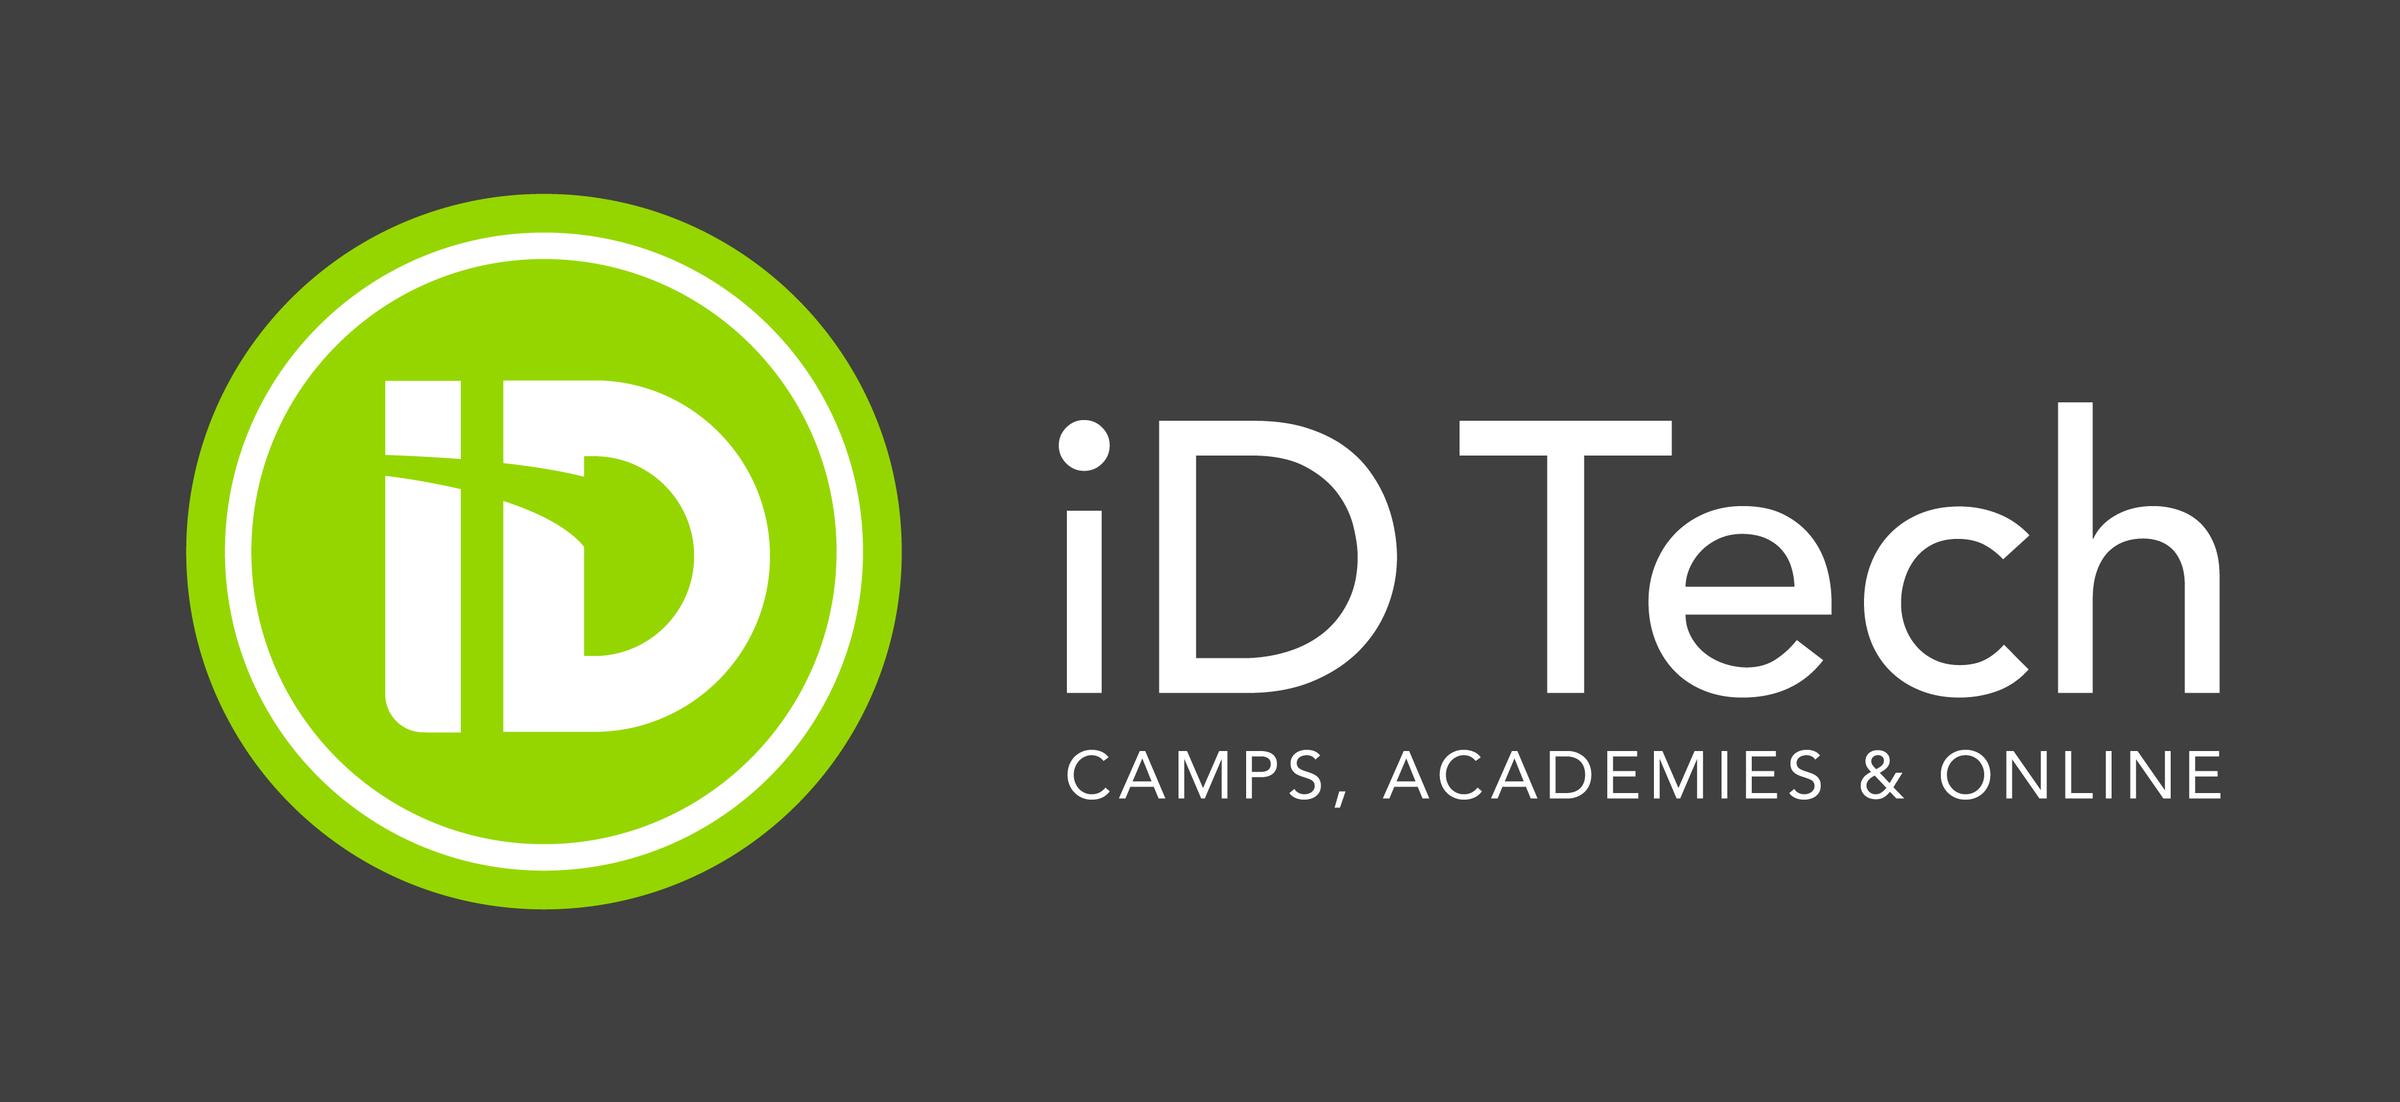 iD Tech Camps: #1 in STEM Education - Held at Vanderbilt University